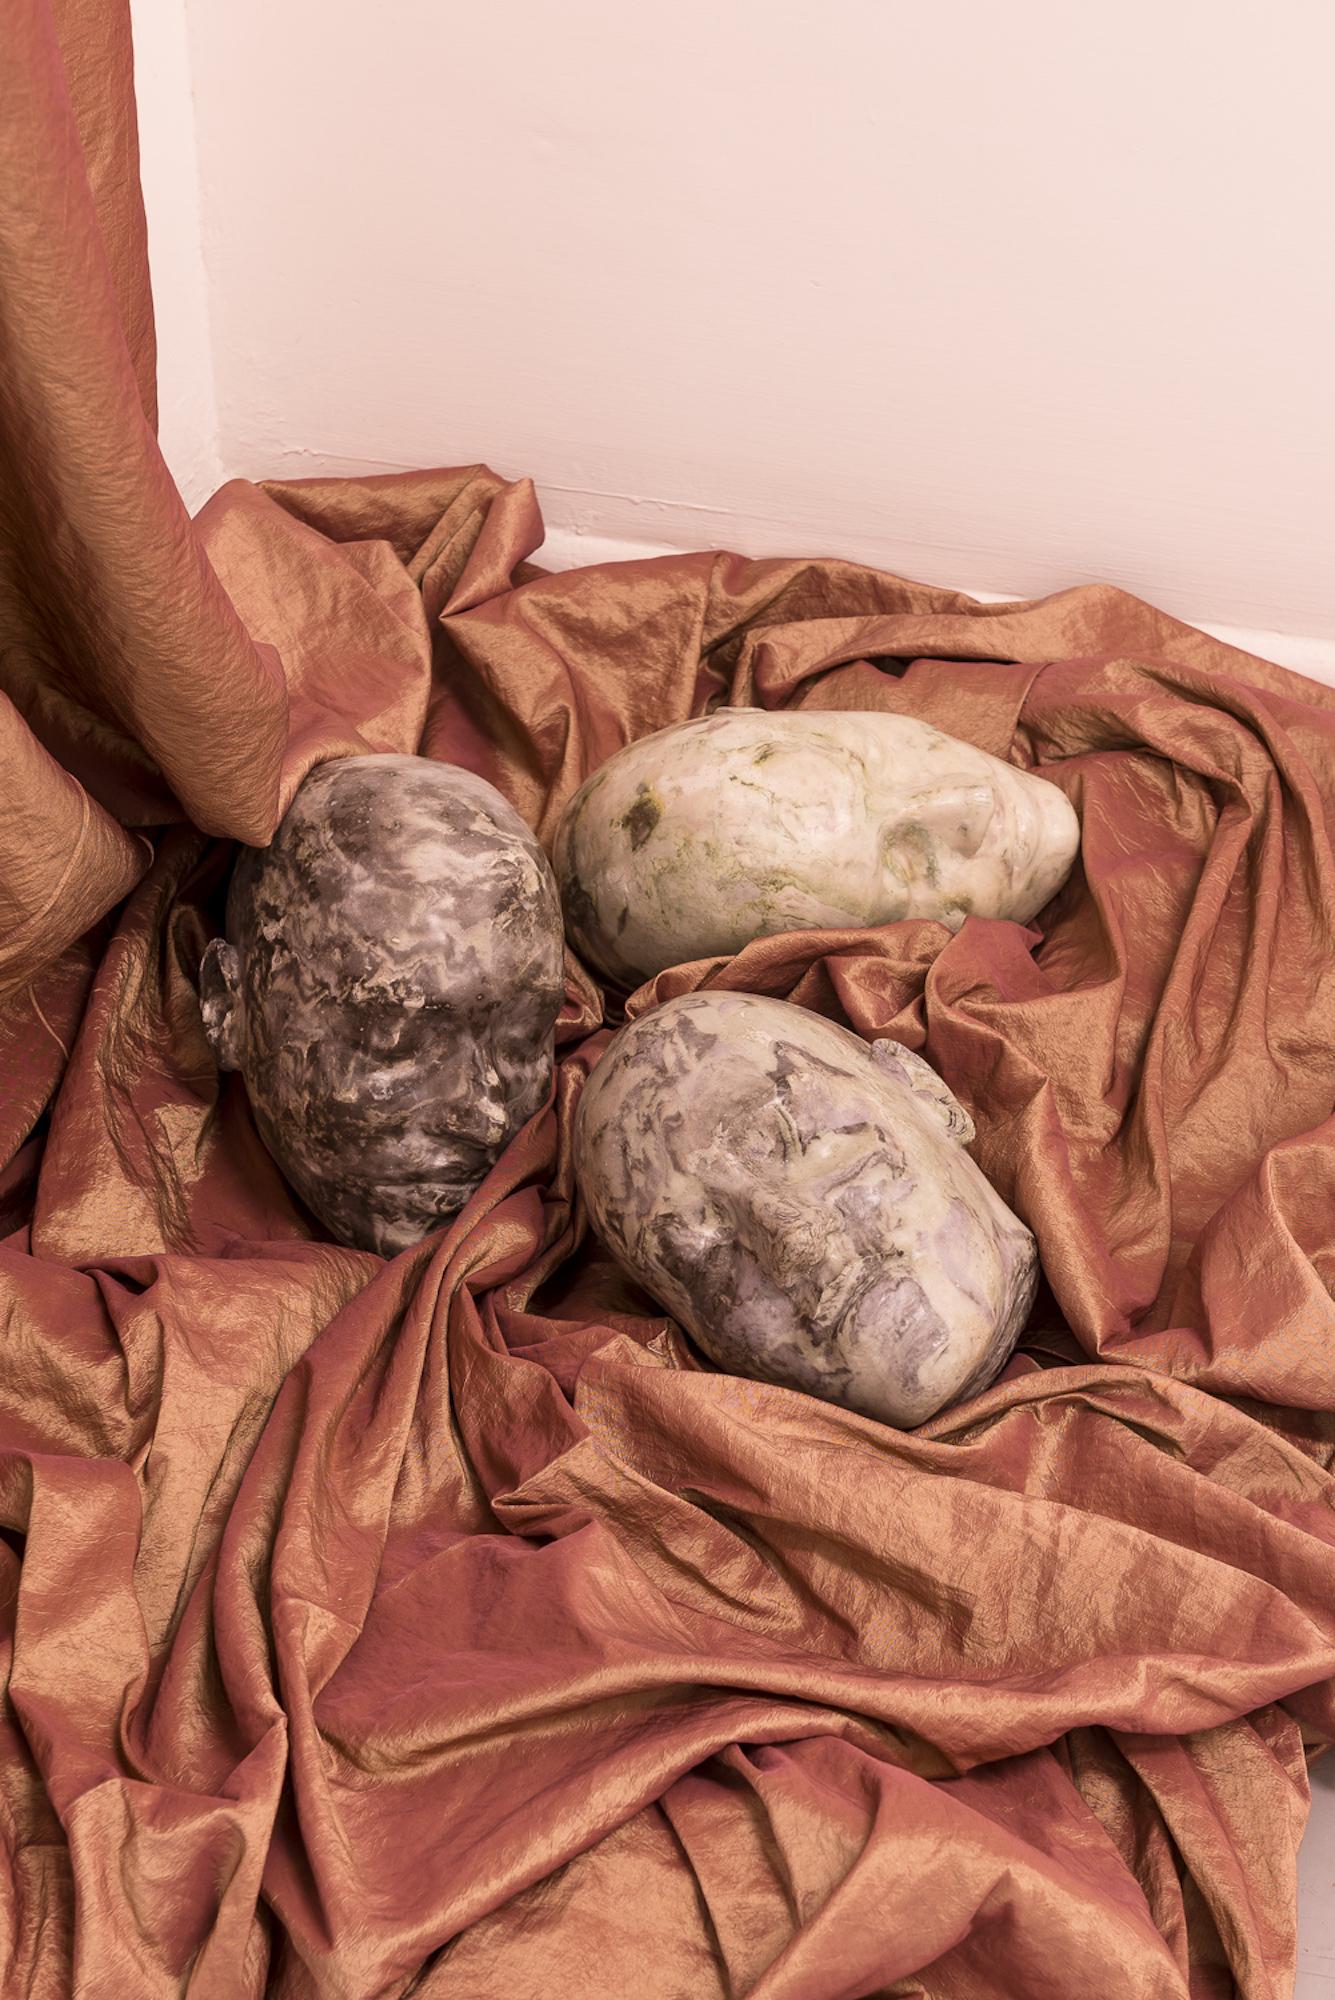 Cleo Fariselli, Dy Yiayi, Exhibition detail. Operativa, Rome. Photo Sebastiano Luciano. 7